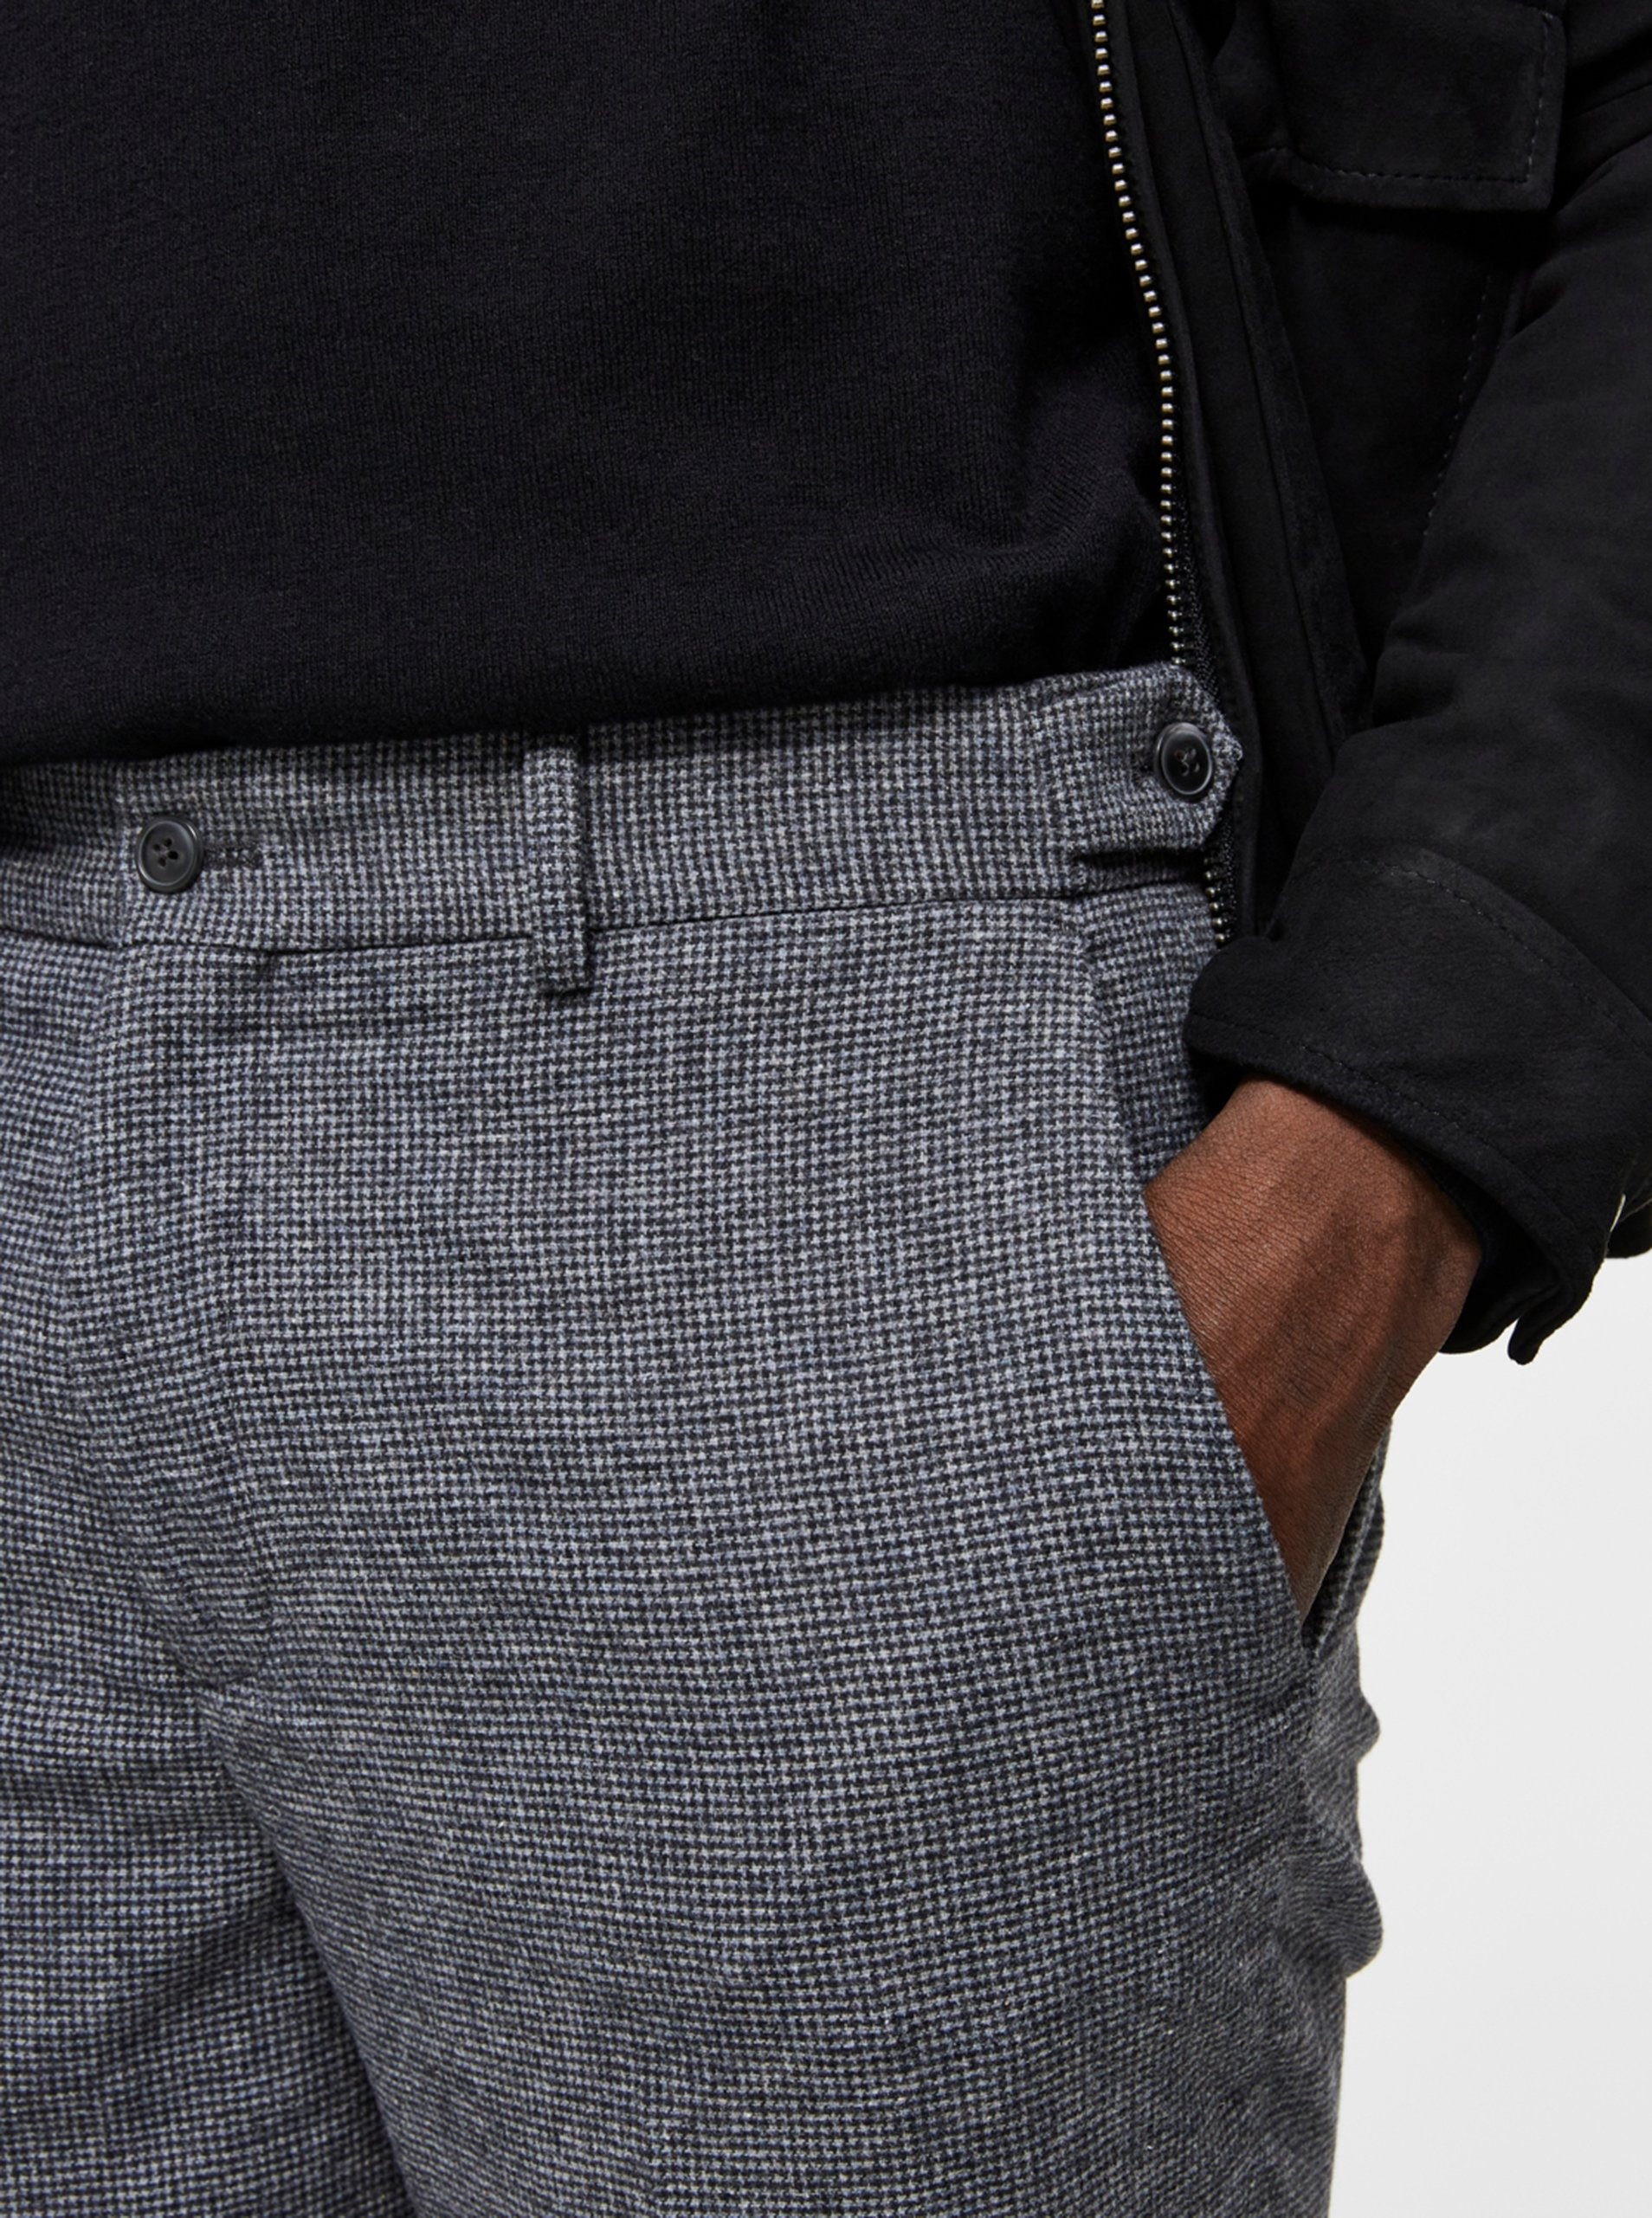 Šedé nohavice s prímesou vlny Selected Homme.